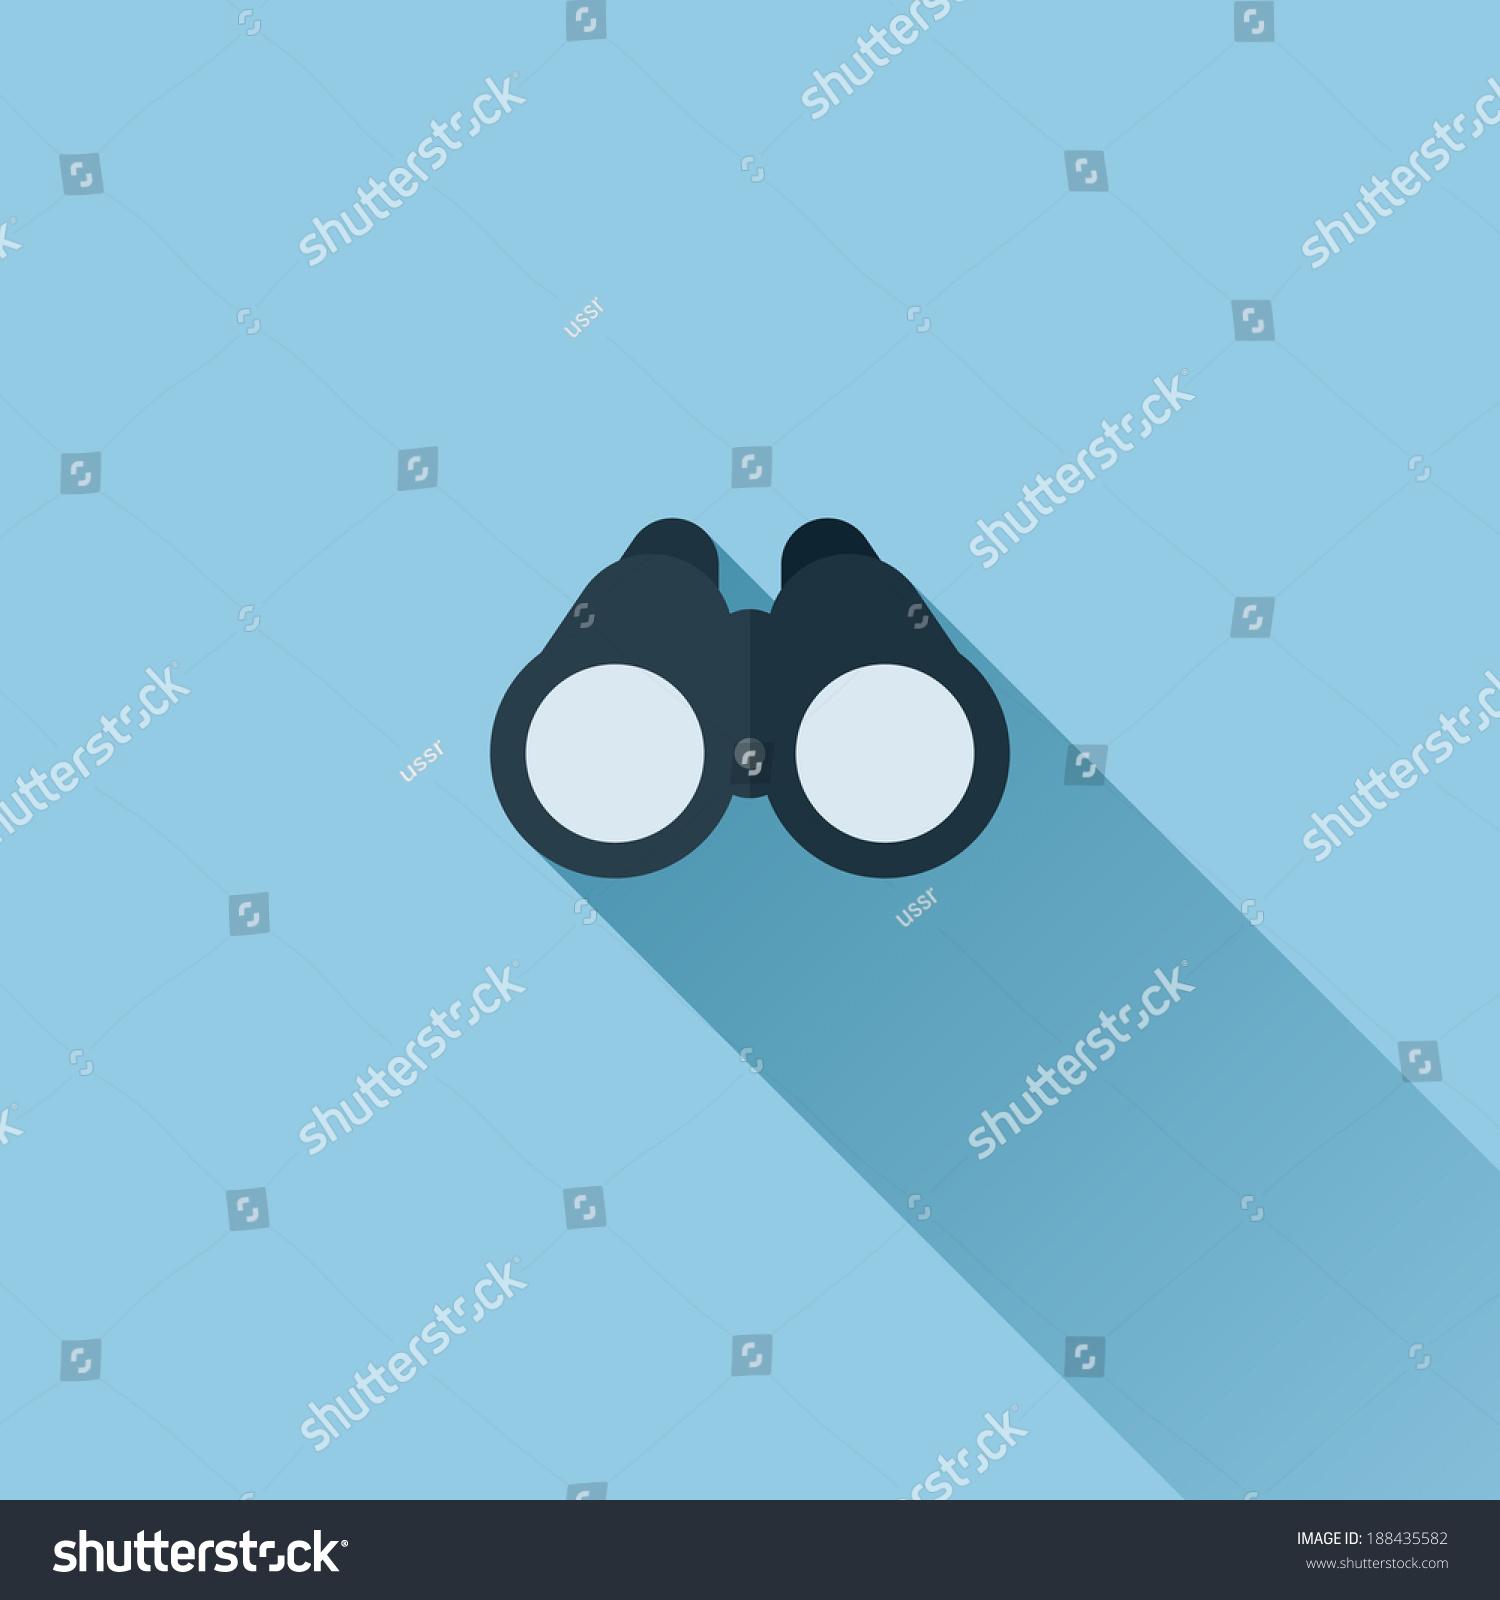 binoculars icon flat - photo #21